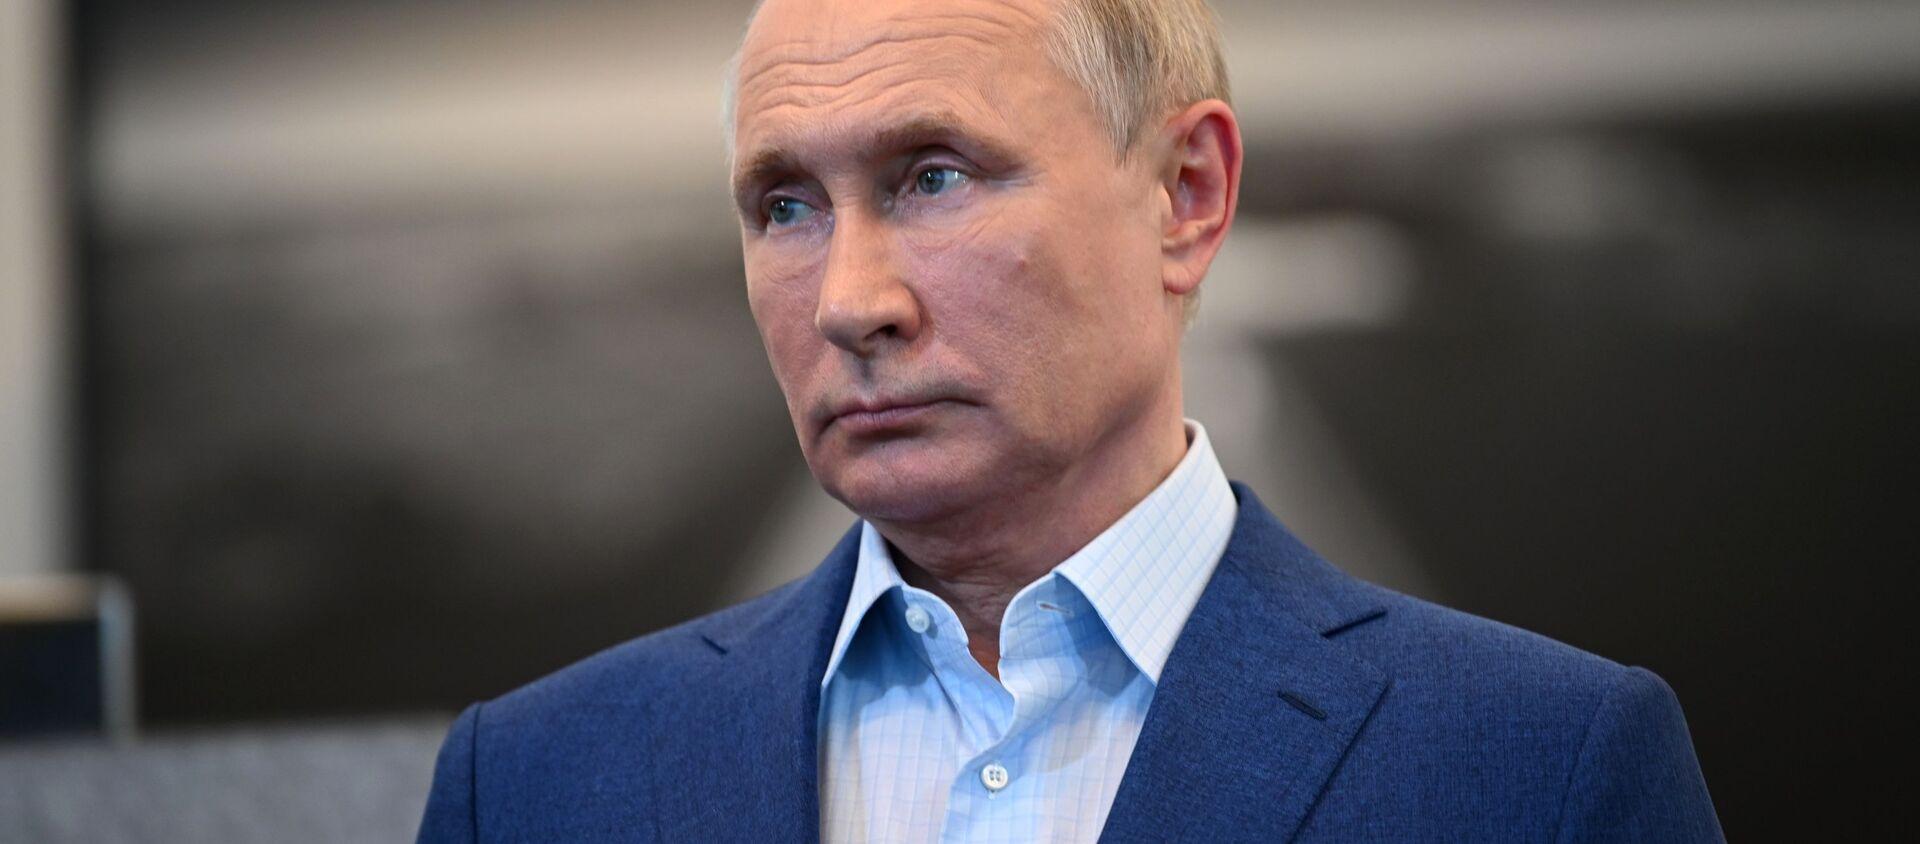 Tổng thống Nga Vladimir Putin - Sputnik Việt Nam, 1920, 18.08.2021